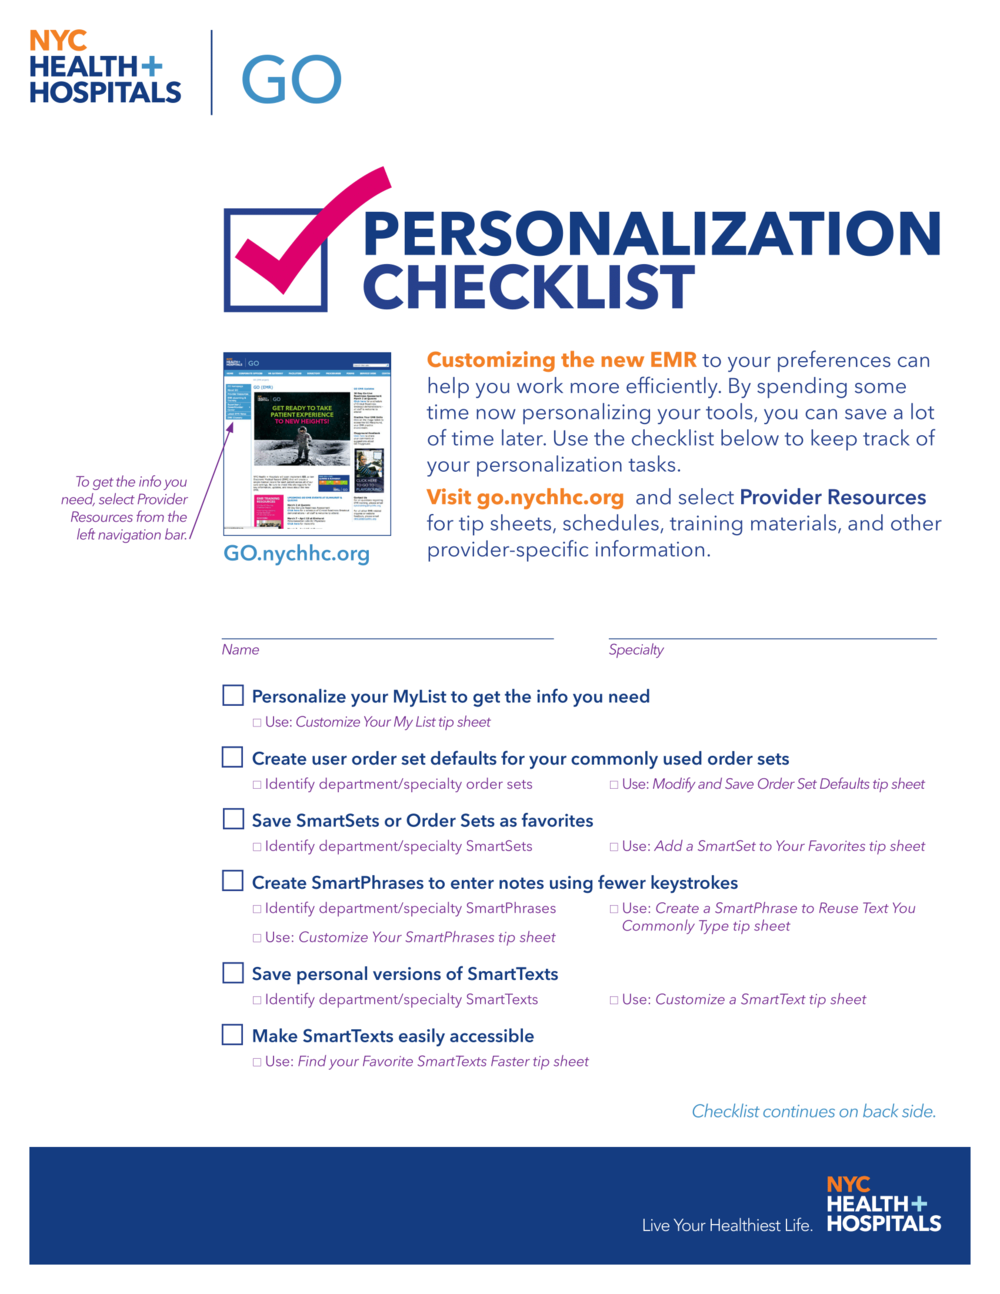 GO_PersonalizationChecklist-1.png